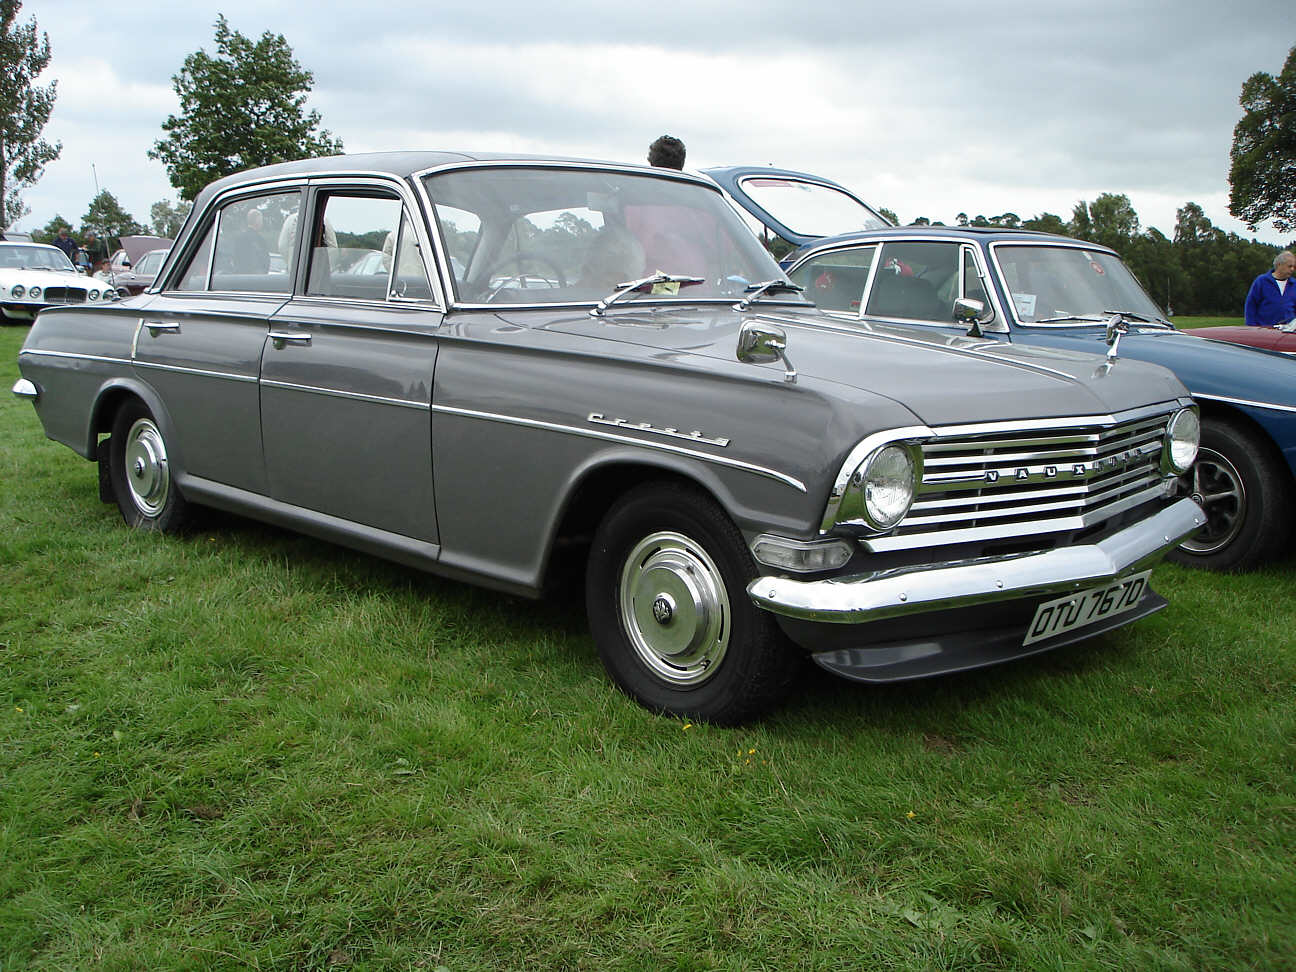 Vauxhall_Cresta_PB_1966.jpg